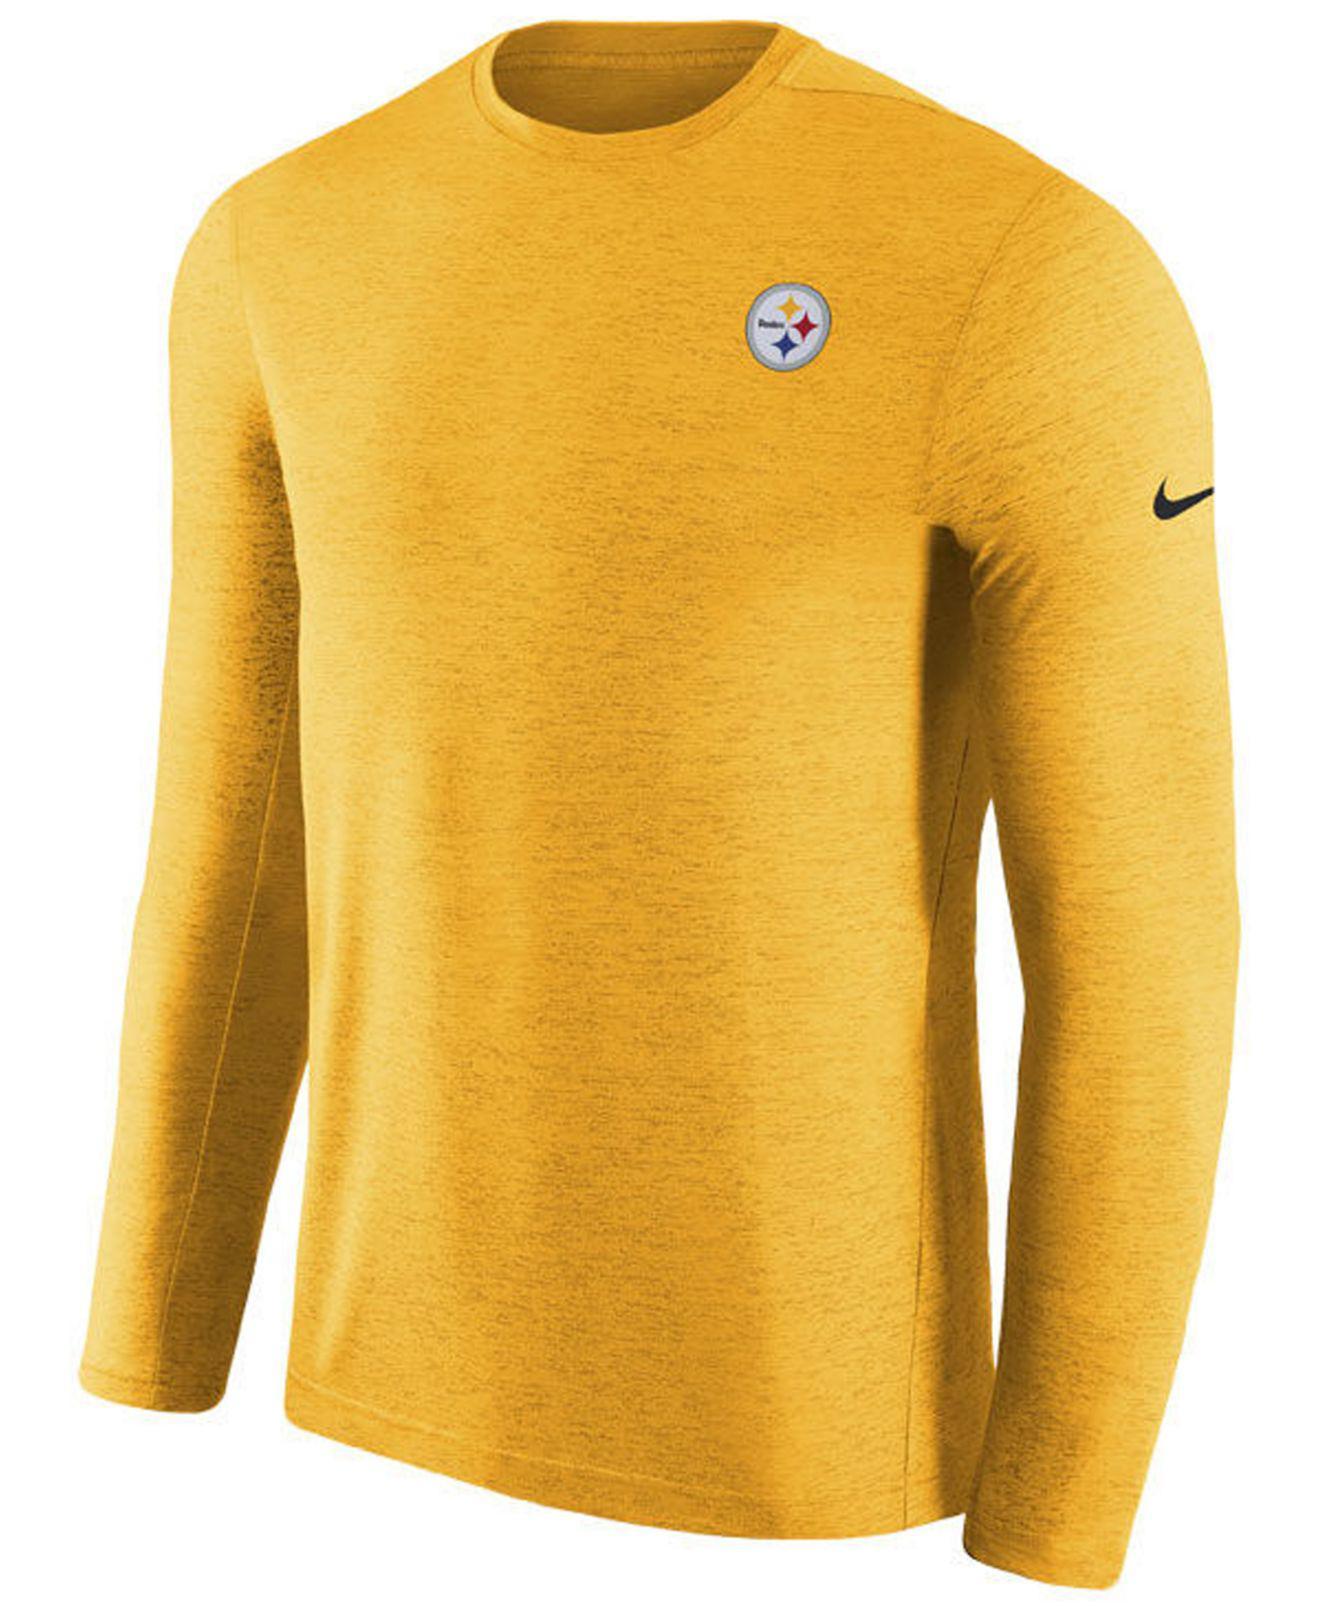 94fafc12e Lyst - Nike Pittsburgh Steelers Coaches Long Sleeve Top in Metallic ...